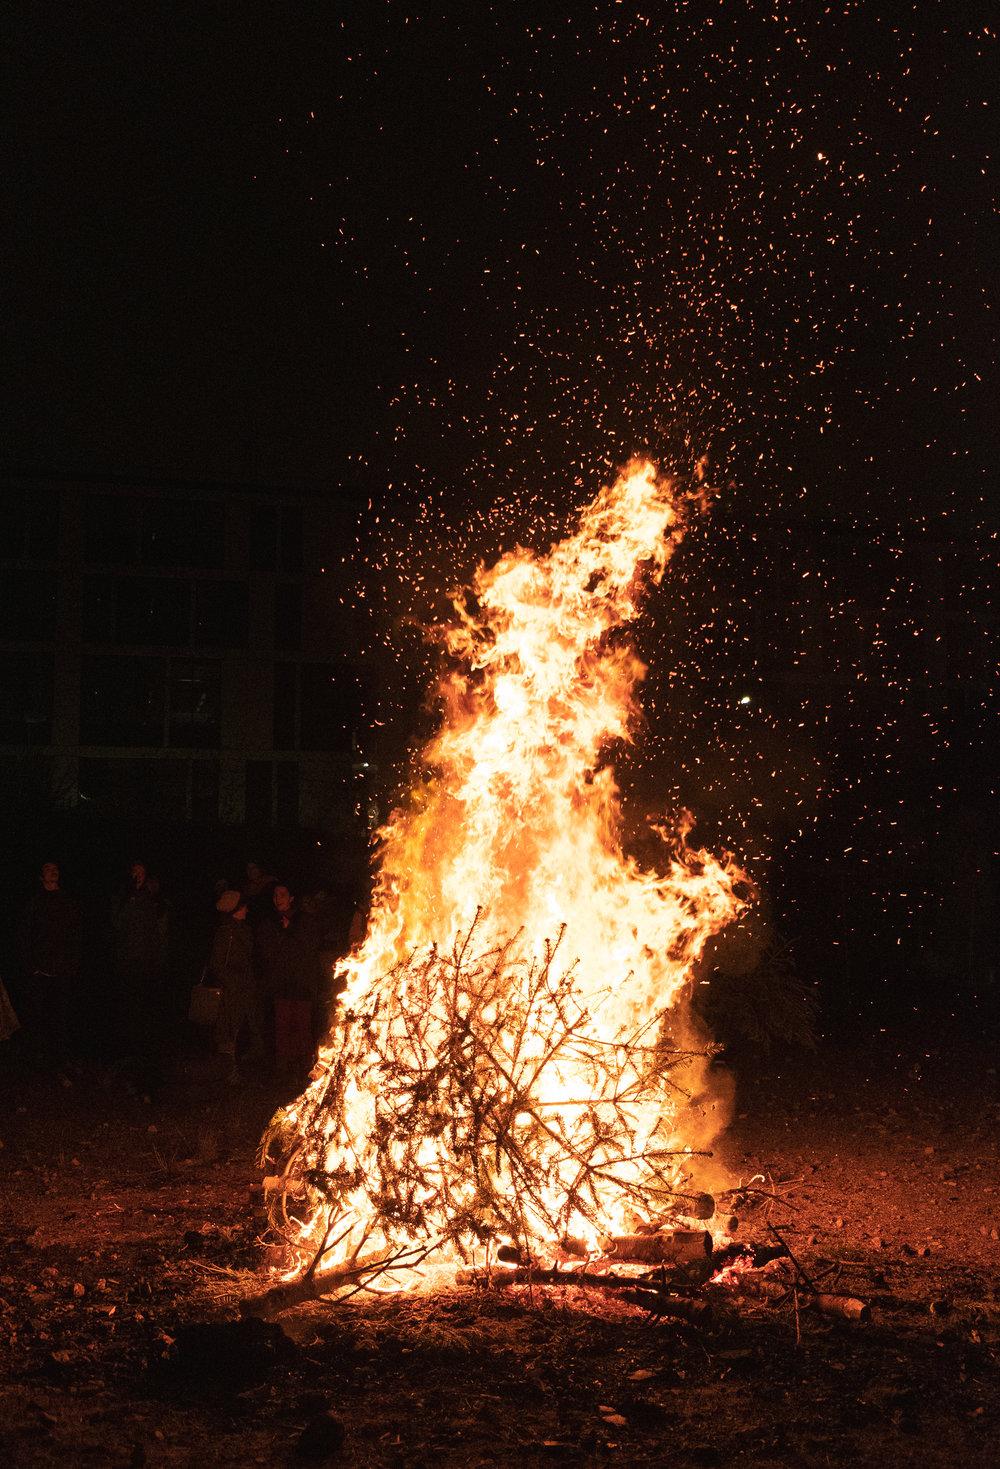 Burning Trees, Edinburgh, Scotland, January 2019, digital photograph